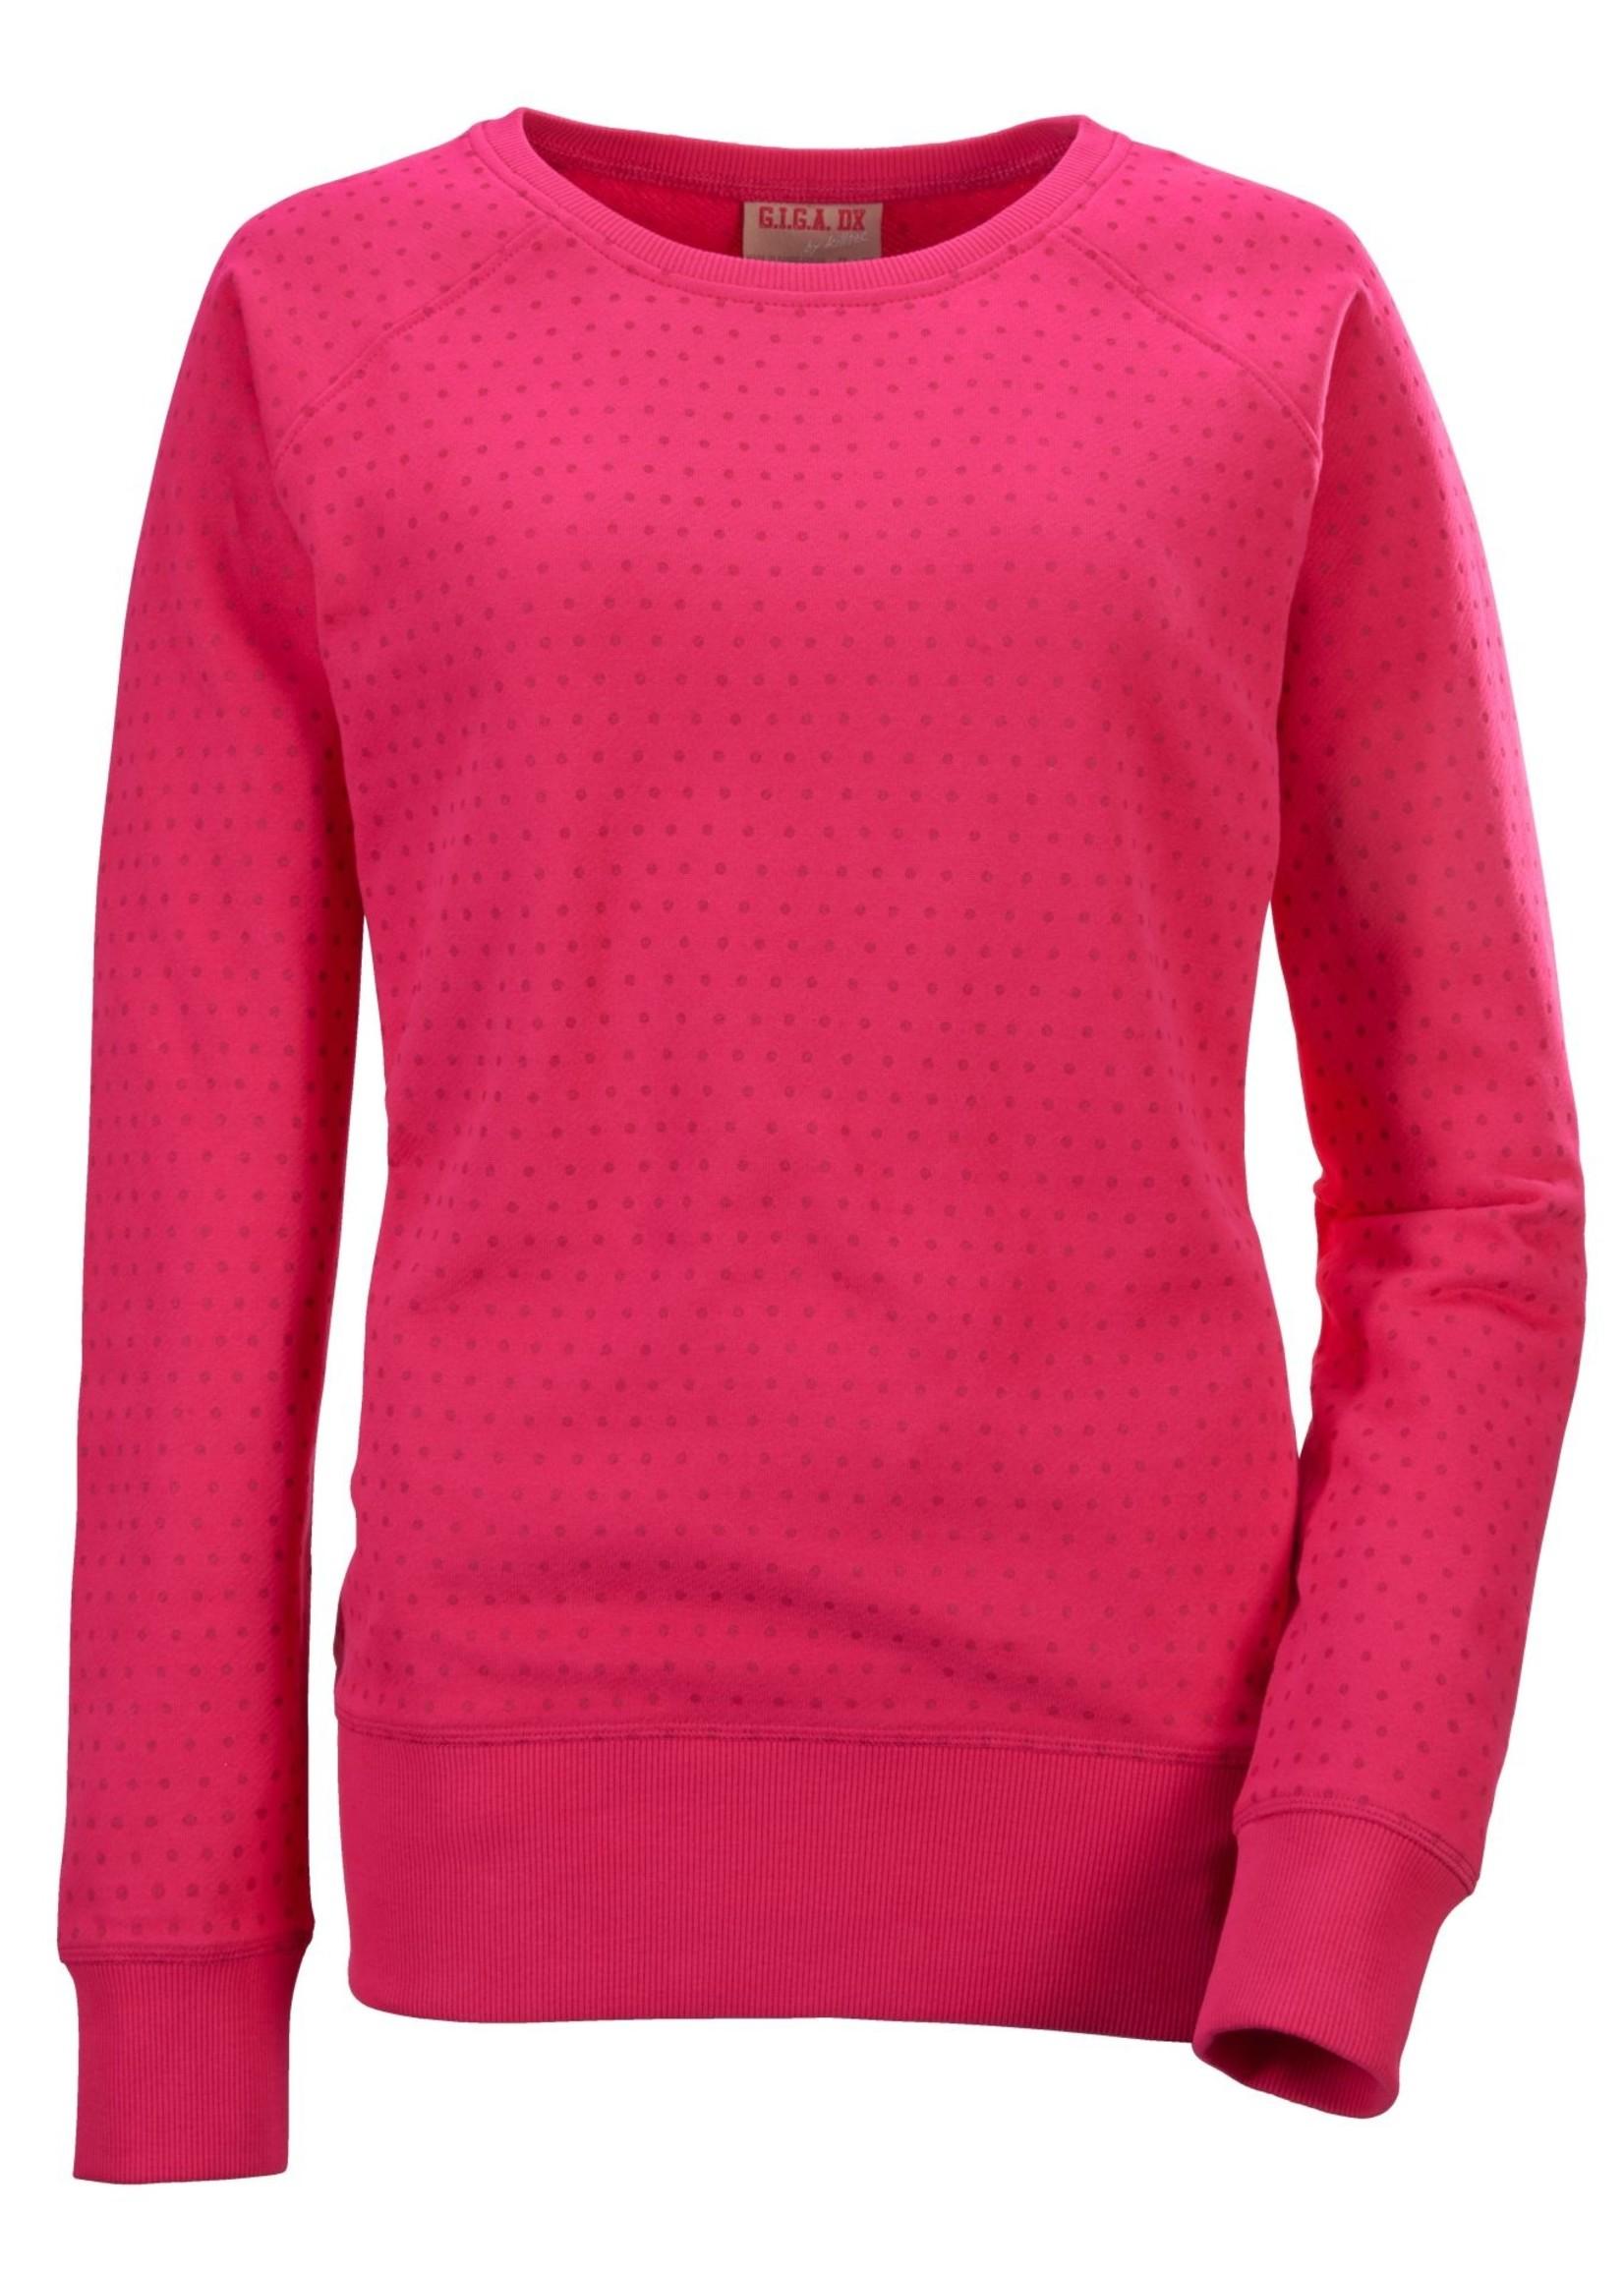 GIGA Bello WMN Sweat Shirt 36729 000 00417